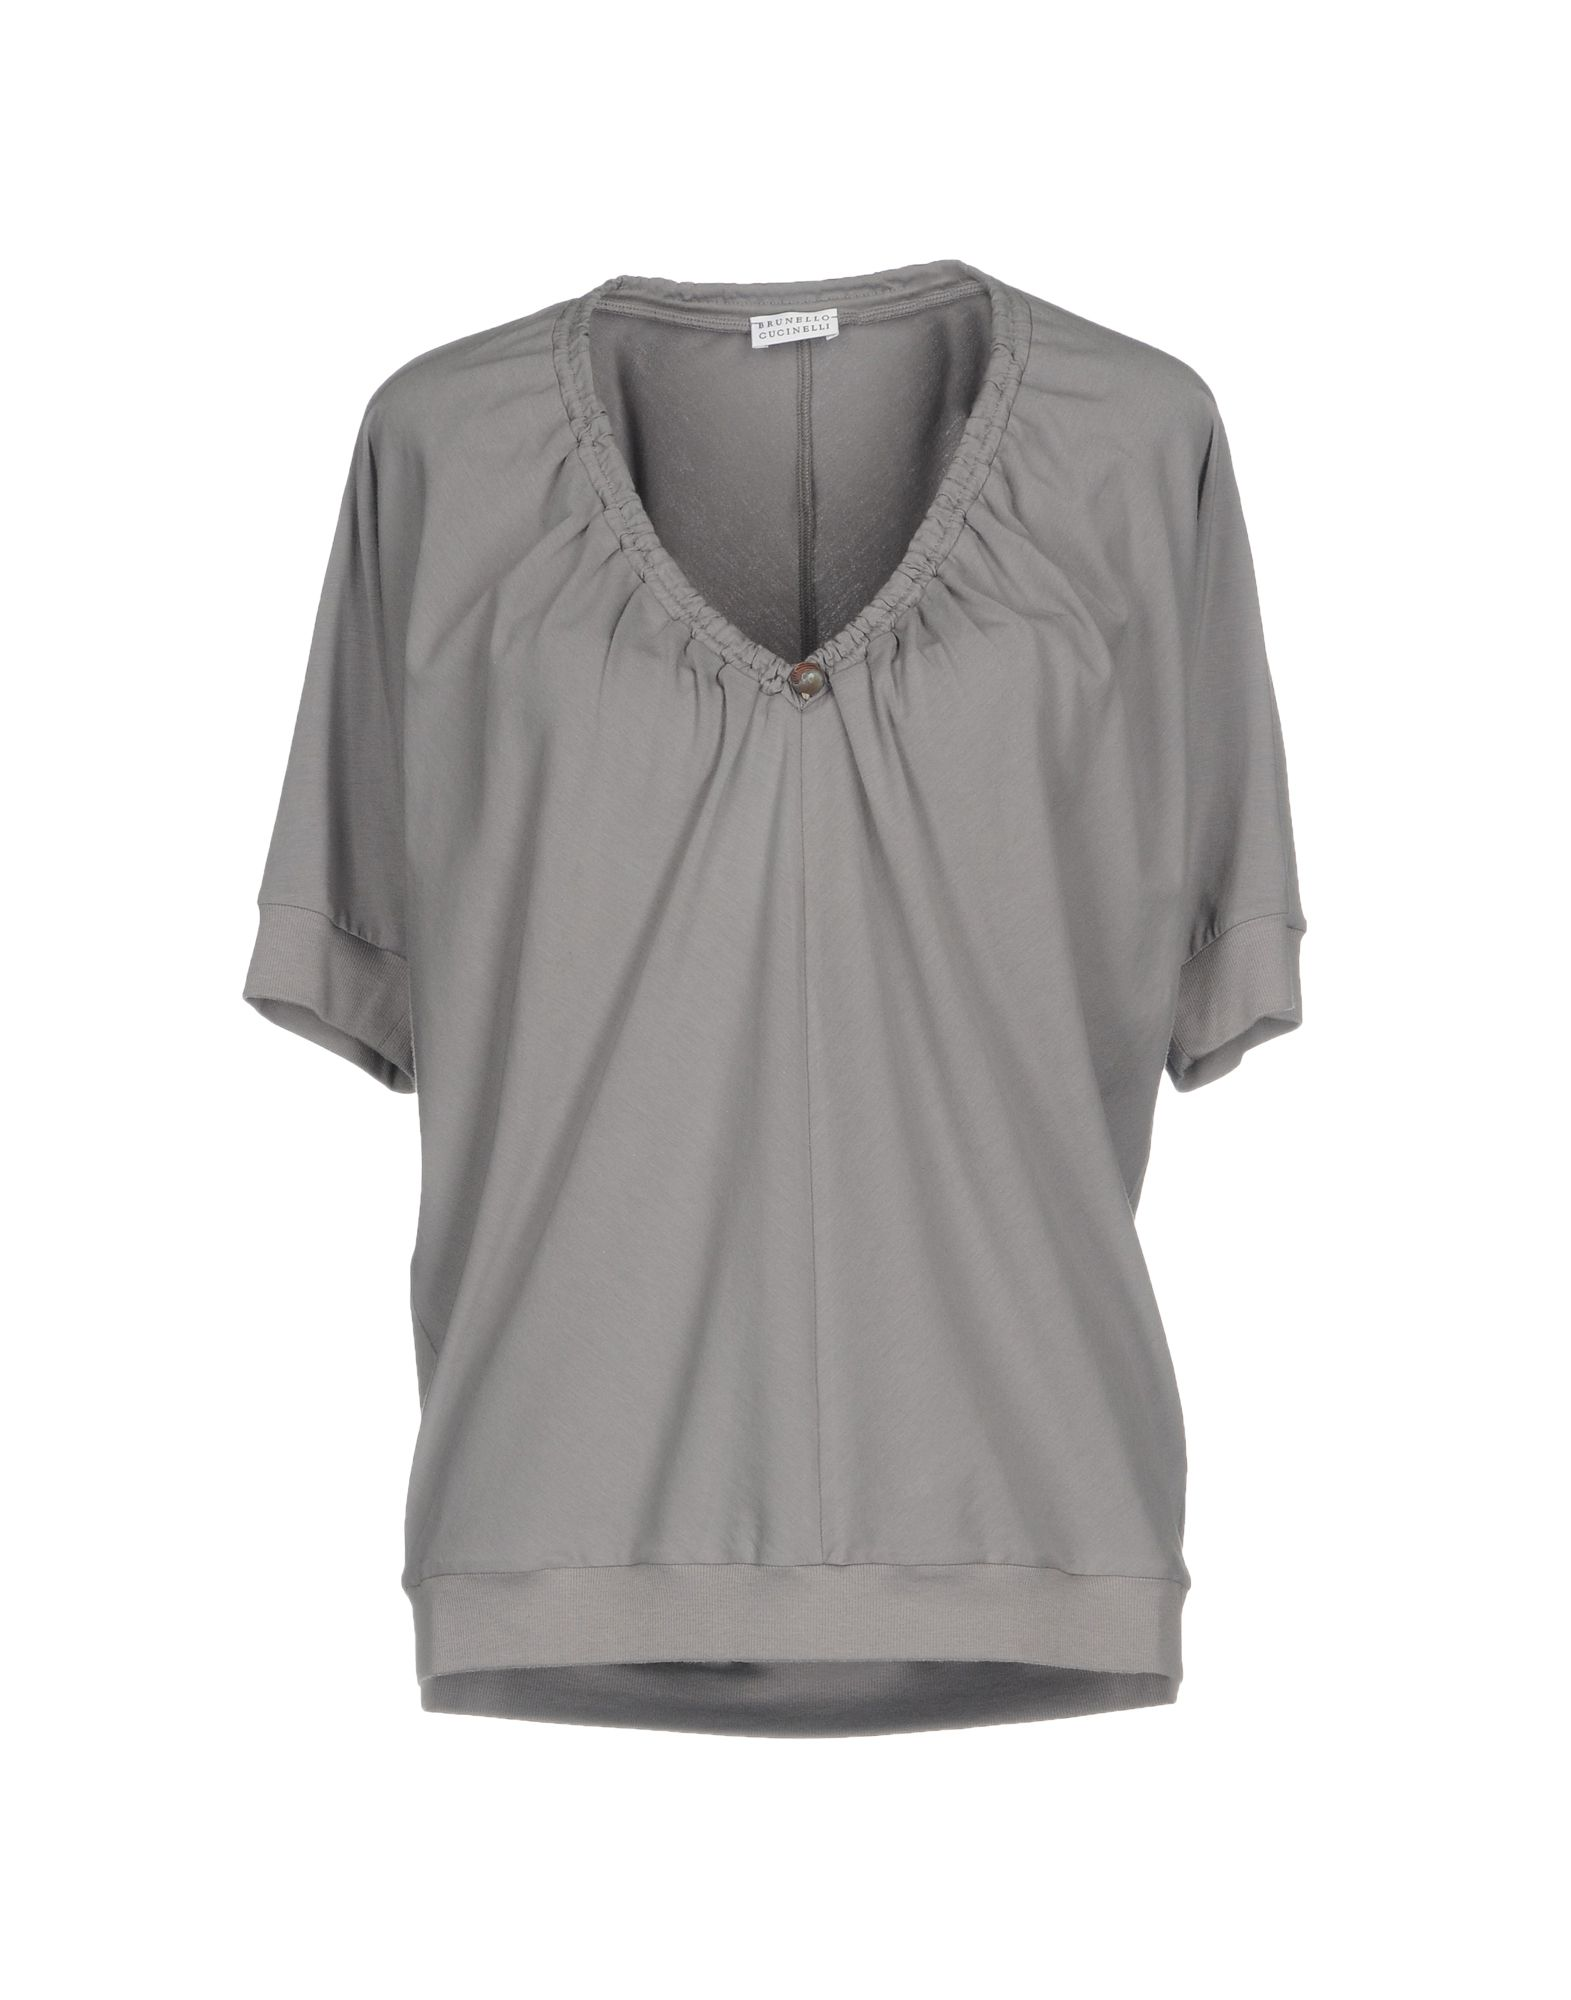 BRUNELLO CUCINELLI Damen T-shirts Farbe Grau Größe 7